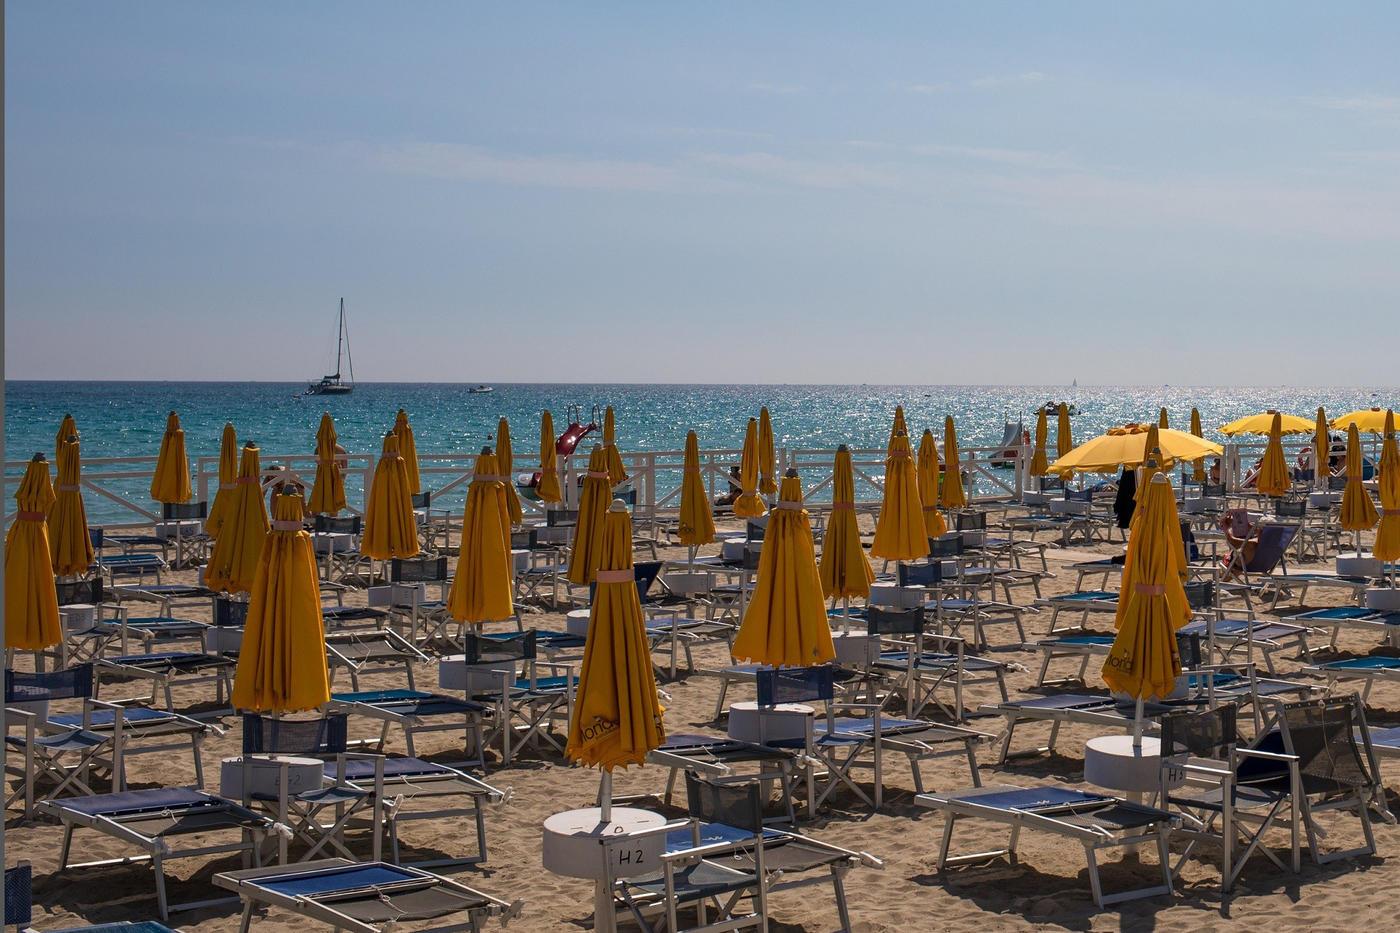 Stabilimento balneare in Vendita a Cinquale, Toscana